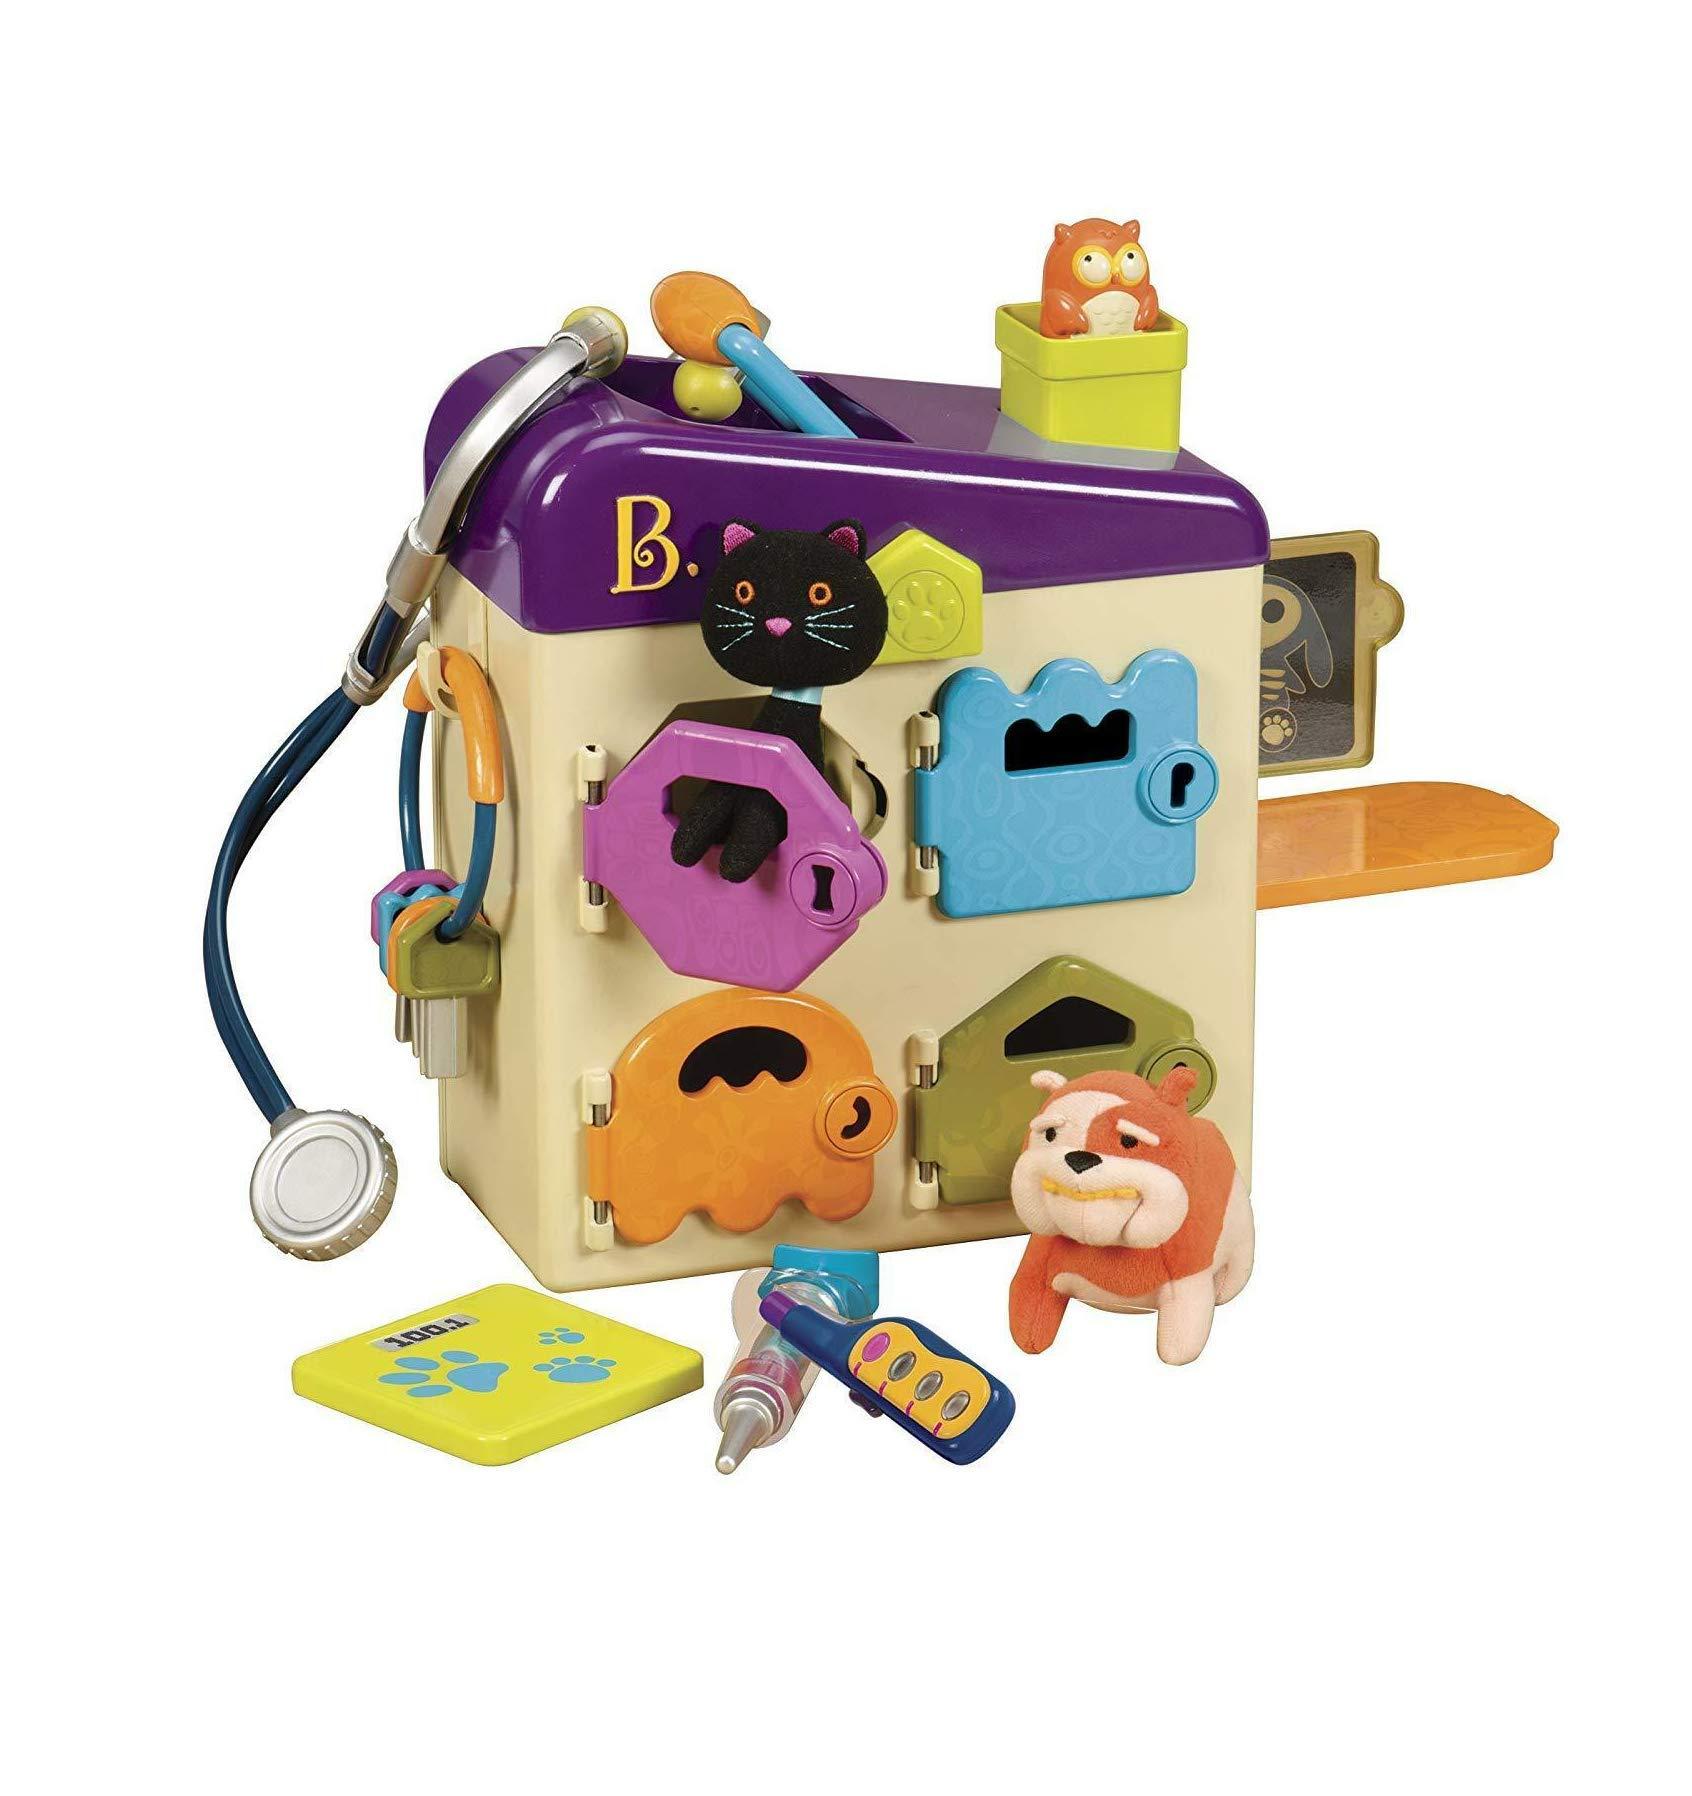 honjekitchen pet Vet Toy Doctor kit for Kids Pretend Play 8 Pieces 1 pcs